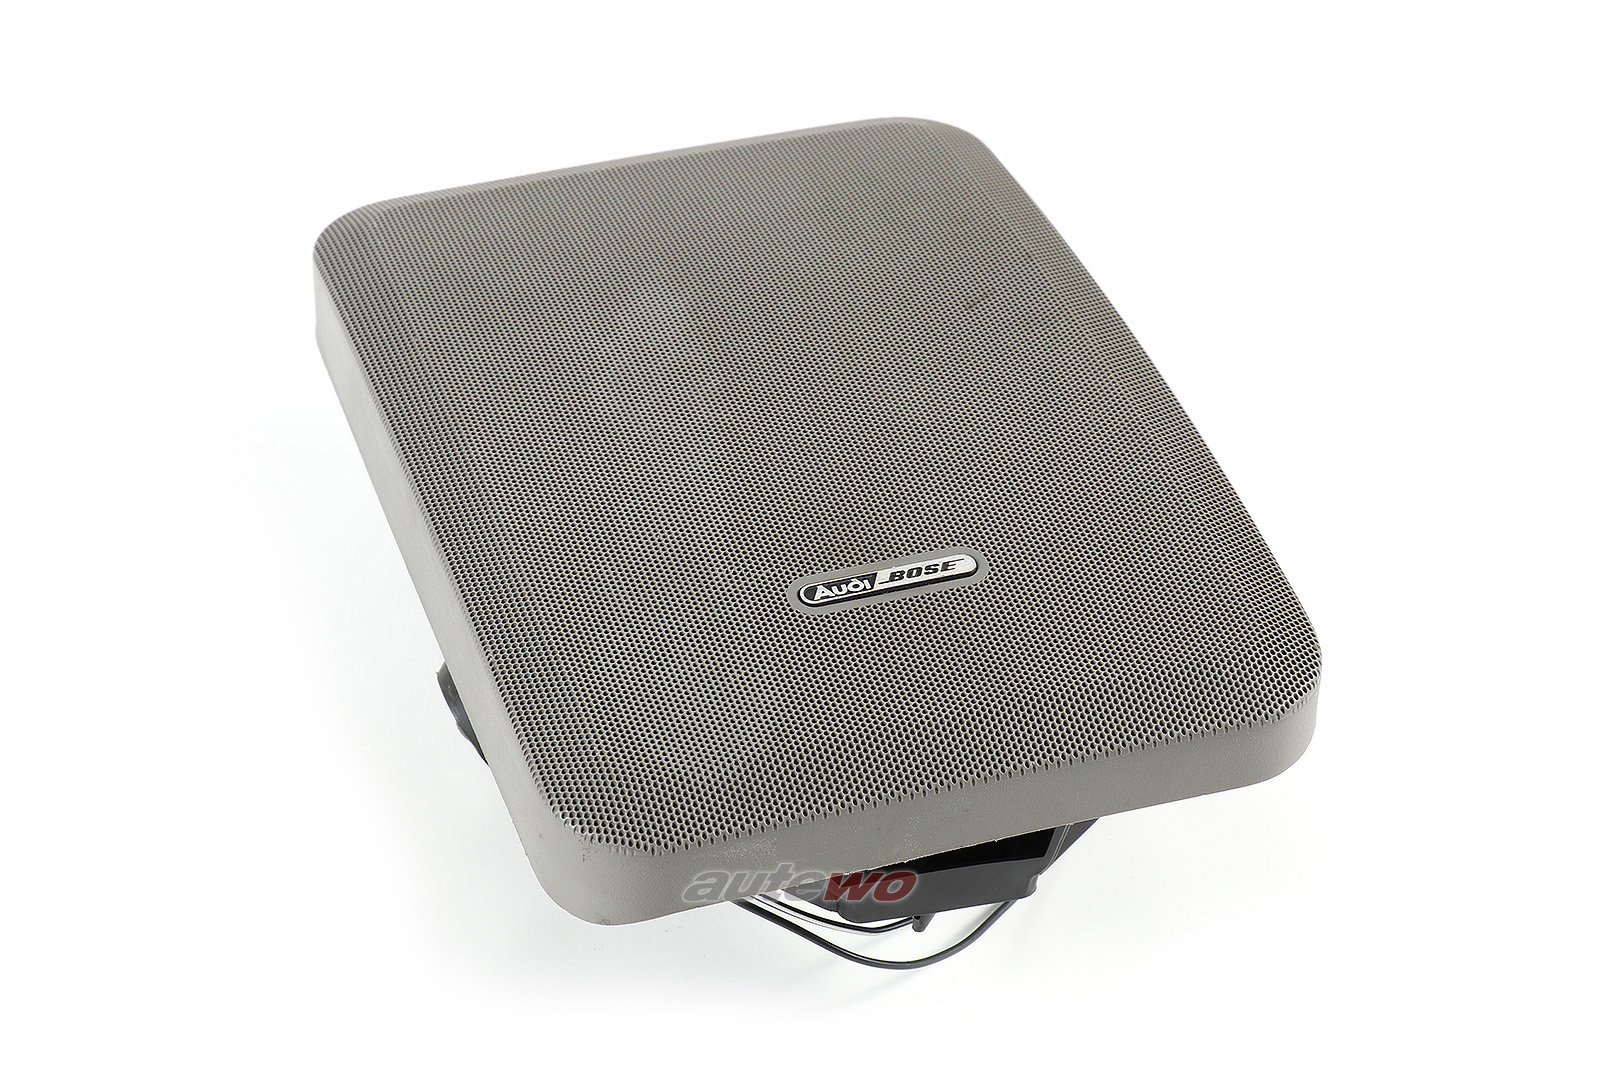 4a5035402c audi 100 s4 a6 s6 c4 lautsprecher bose. Black Bedroom Furniture Sets. Home Design Ideas